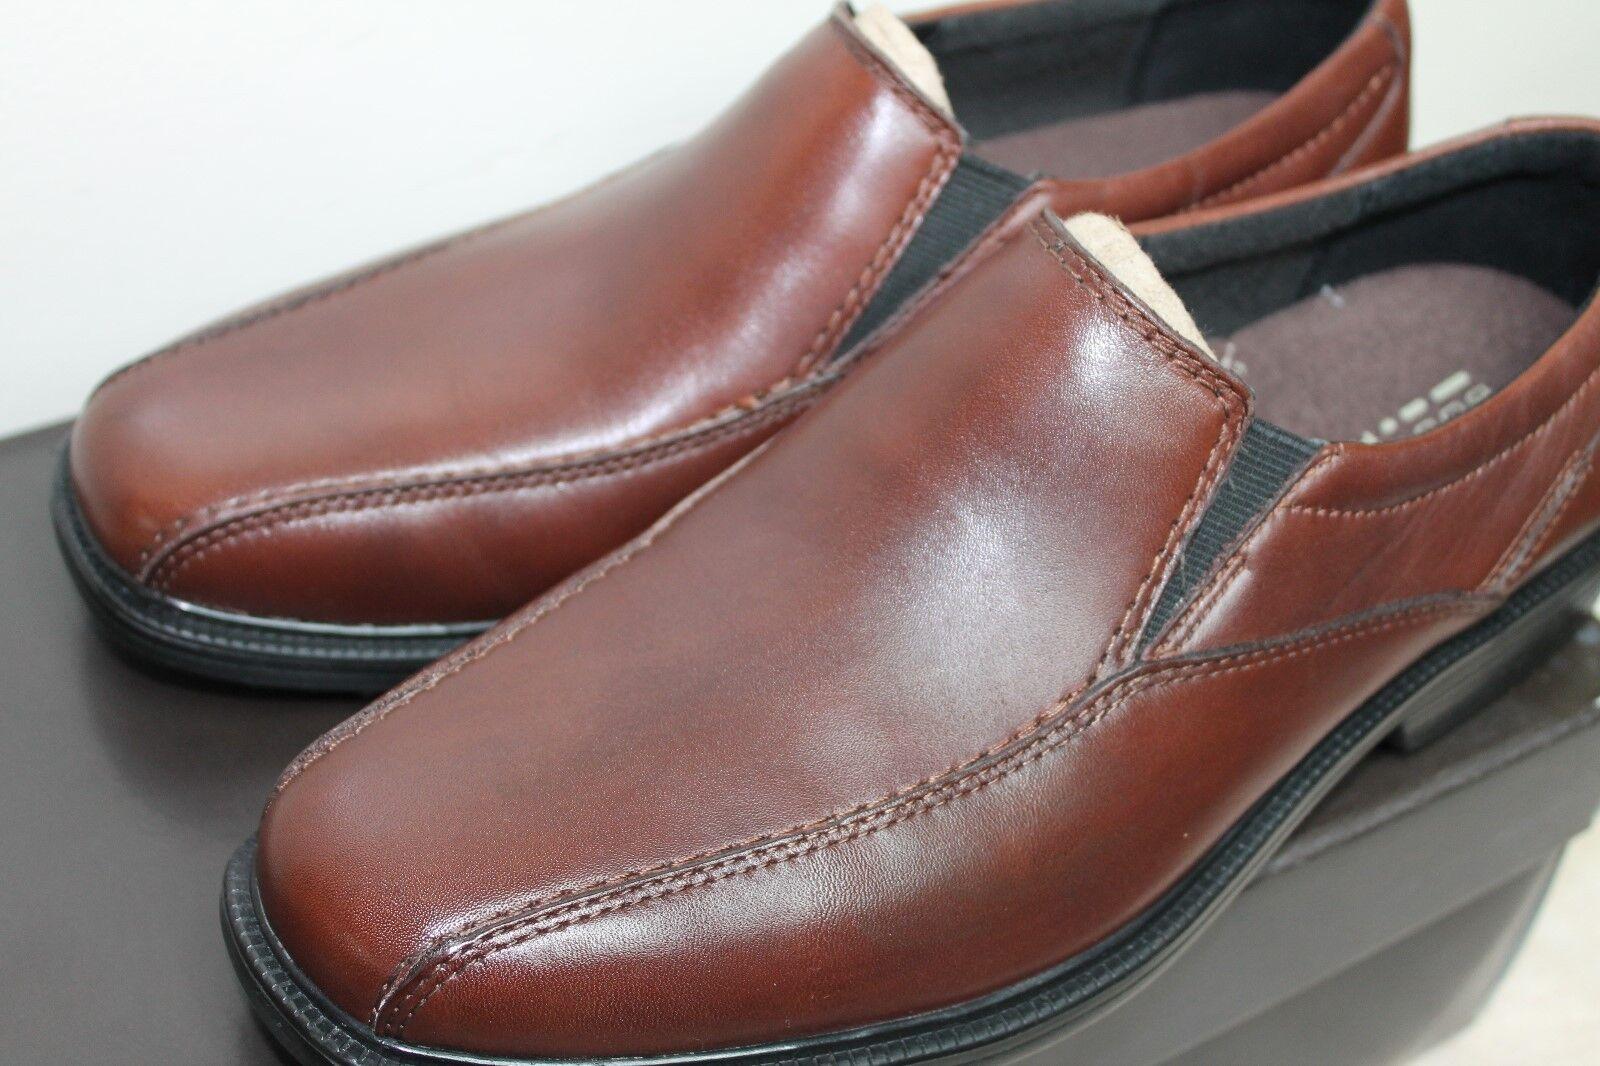 Bostonian Men's Dress Shoes Flexlite Bolton  Slip-On Shoes Leather Shoes